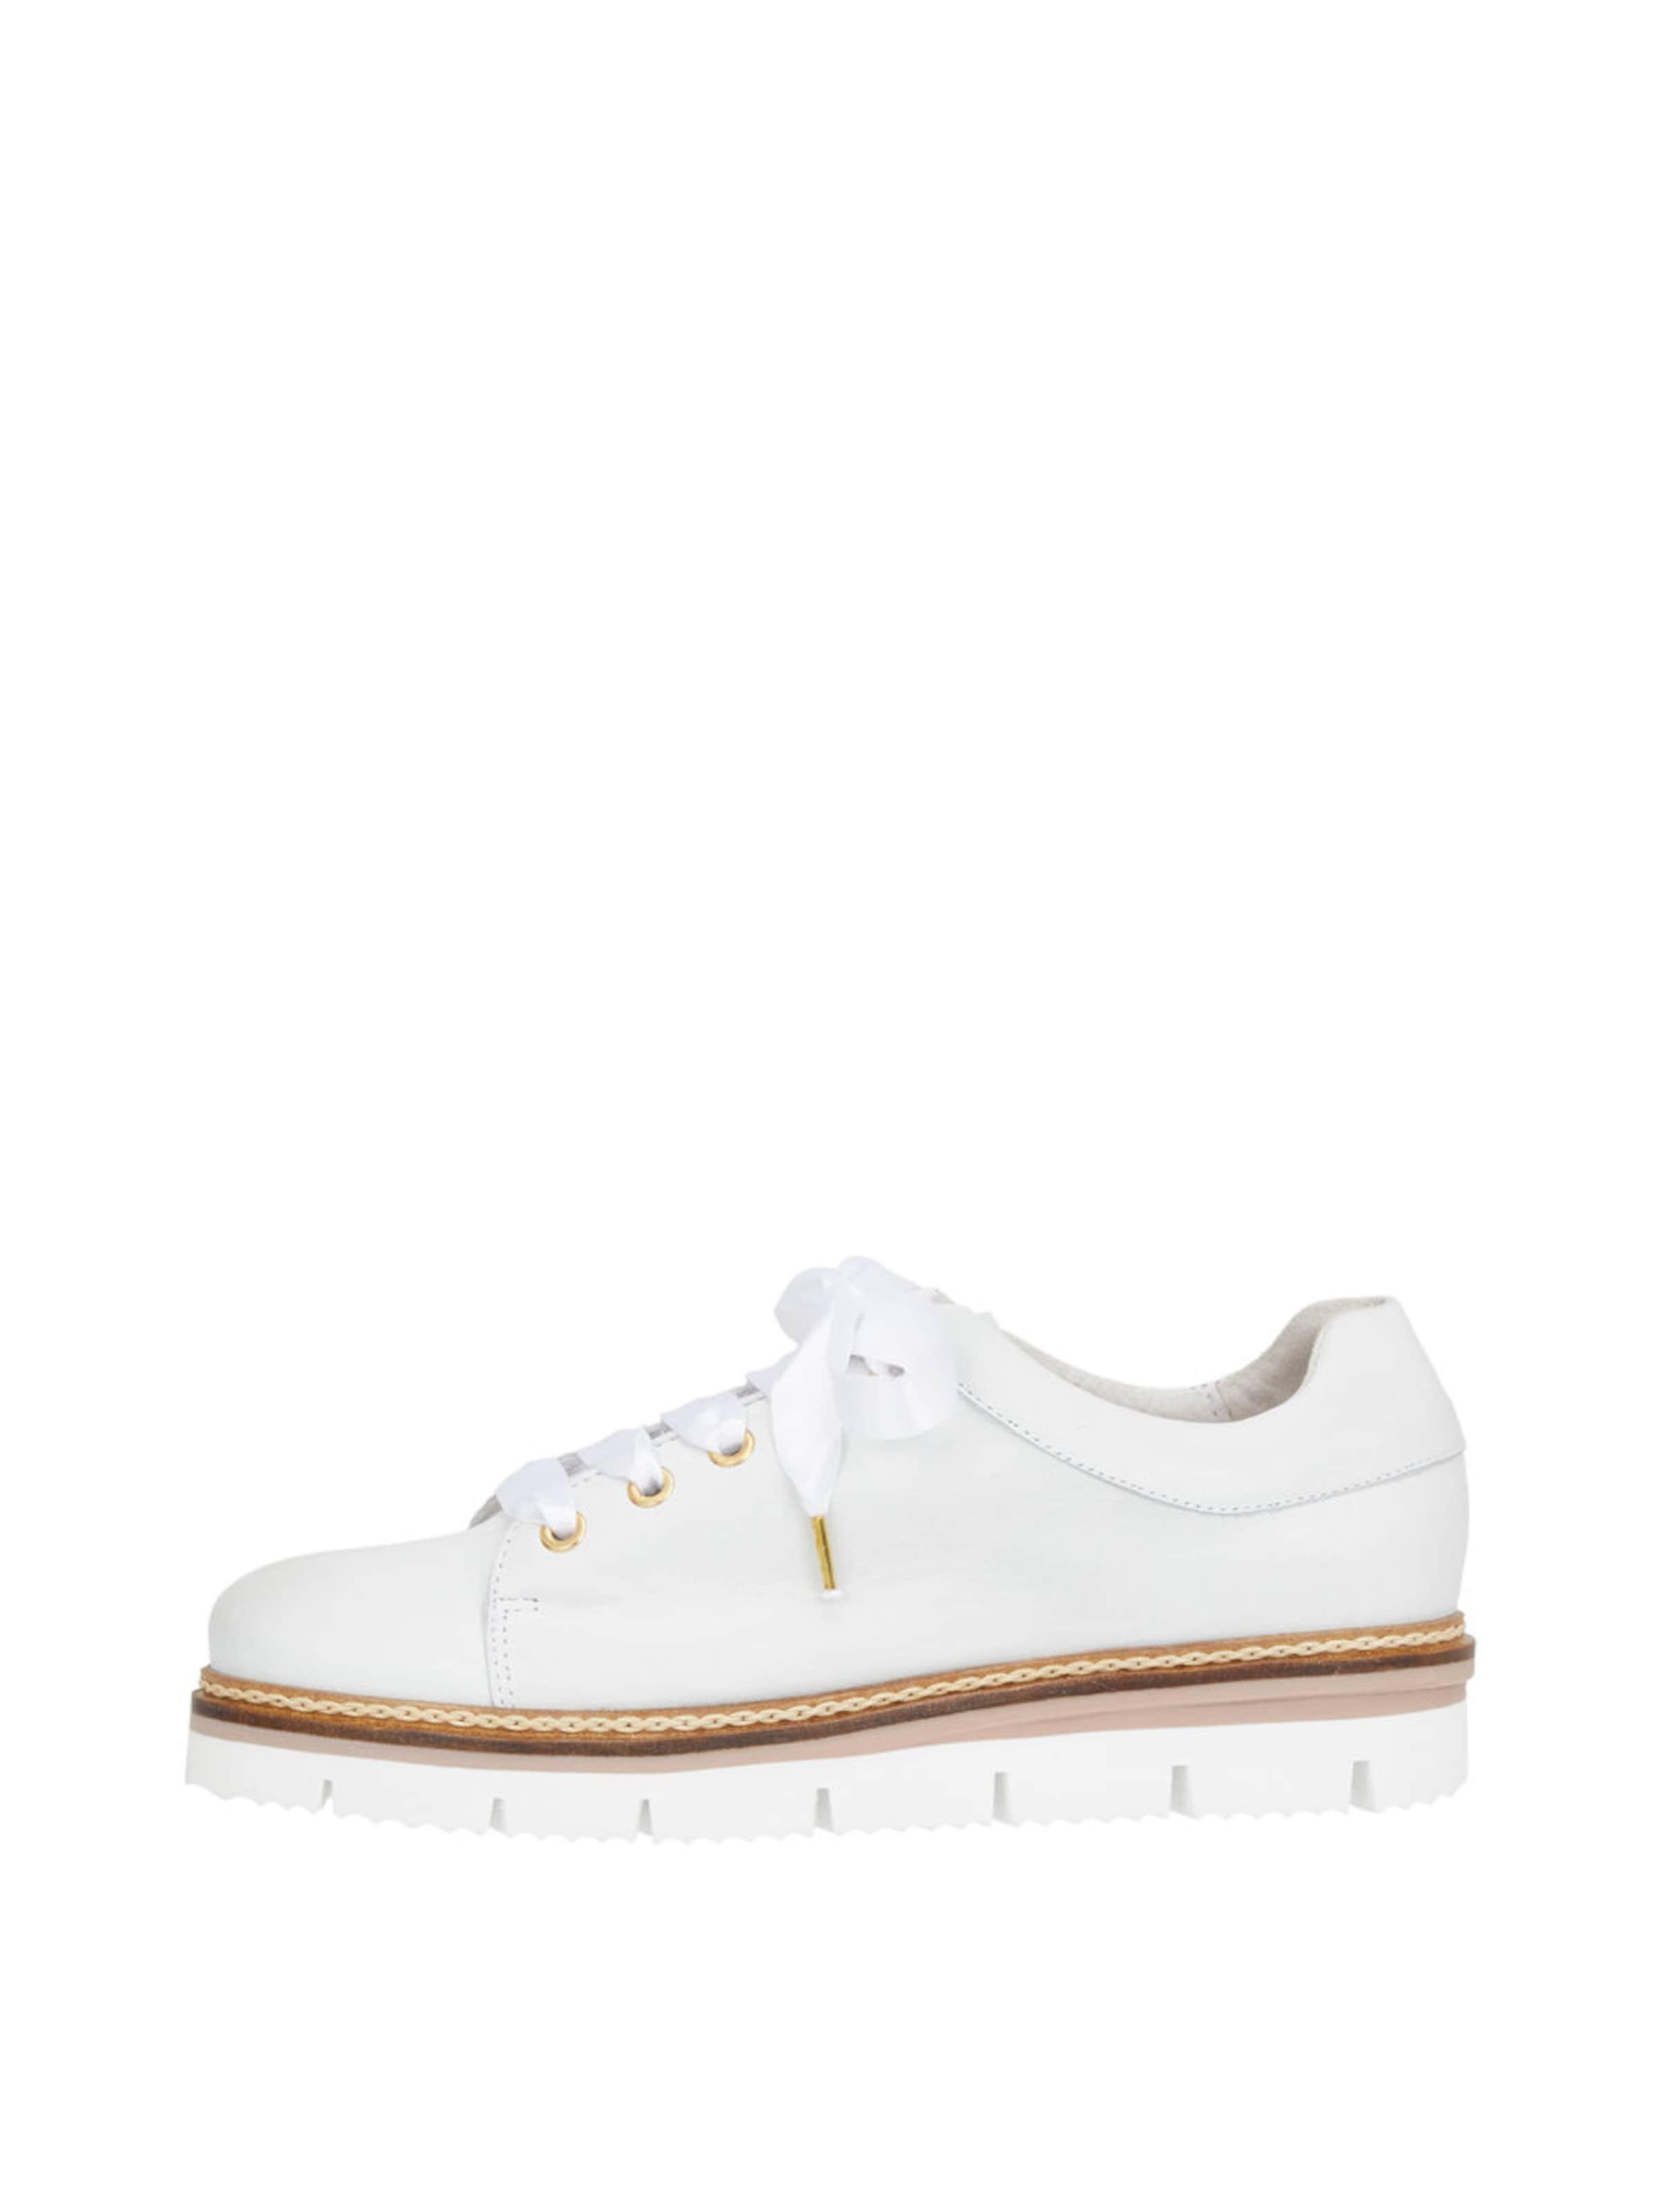 Bianco Bianco Bianco | Rillensohlen Schnür Schuhe 3ae1e6